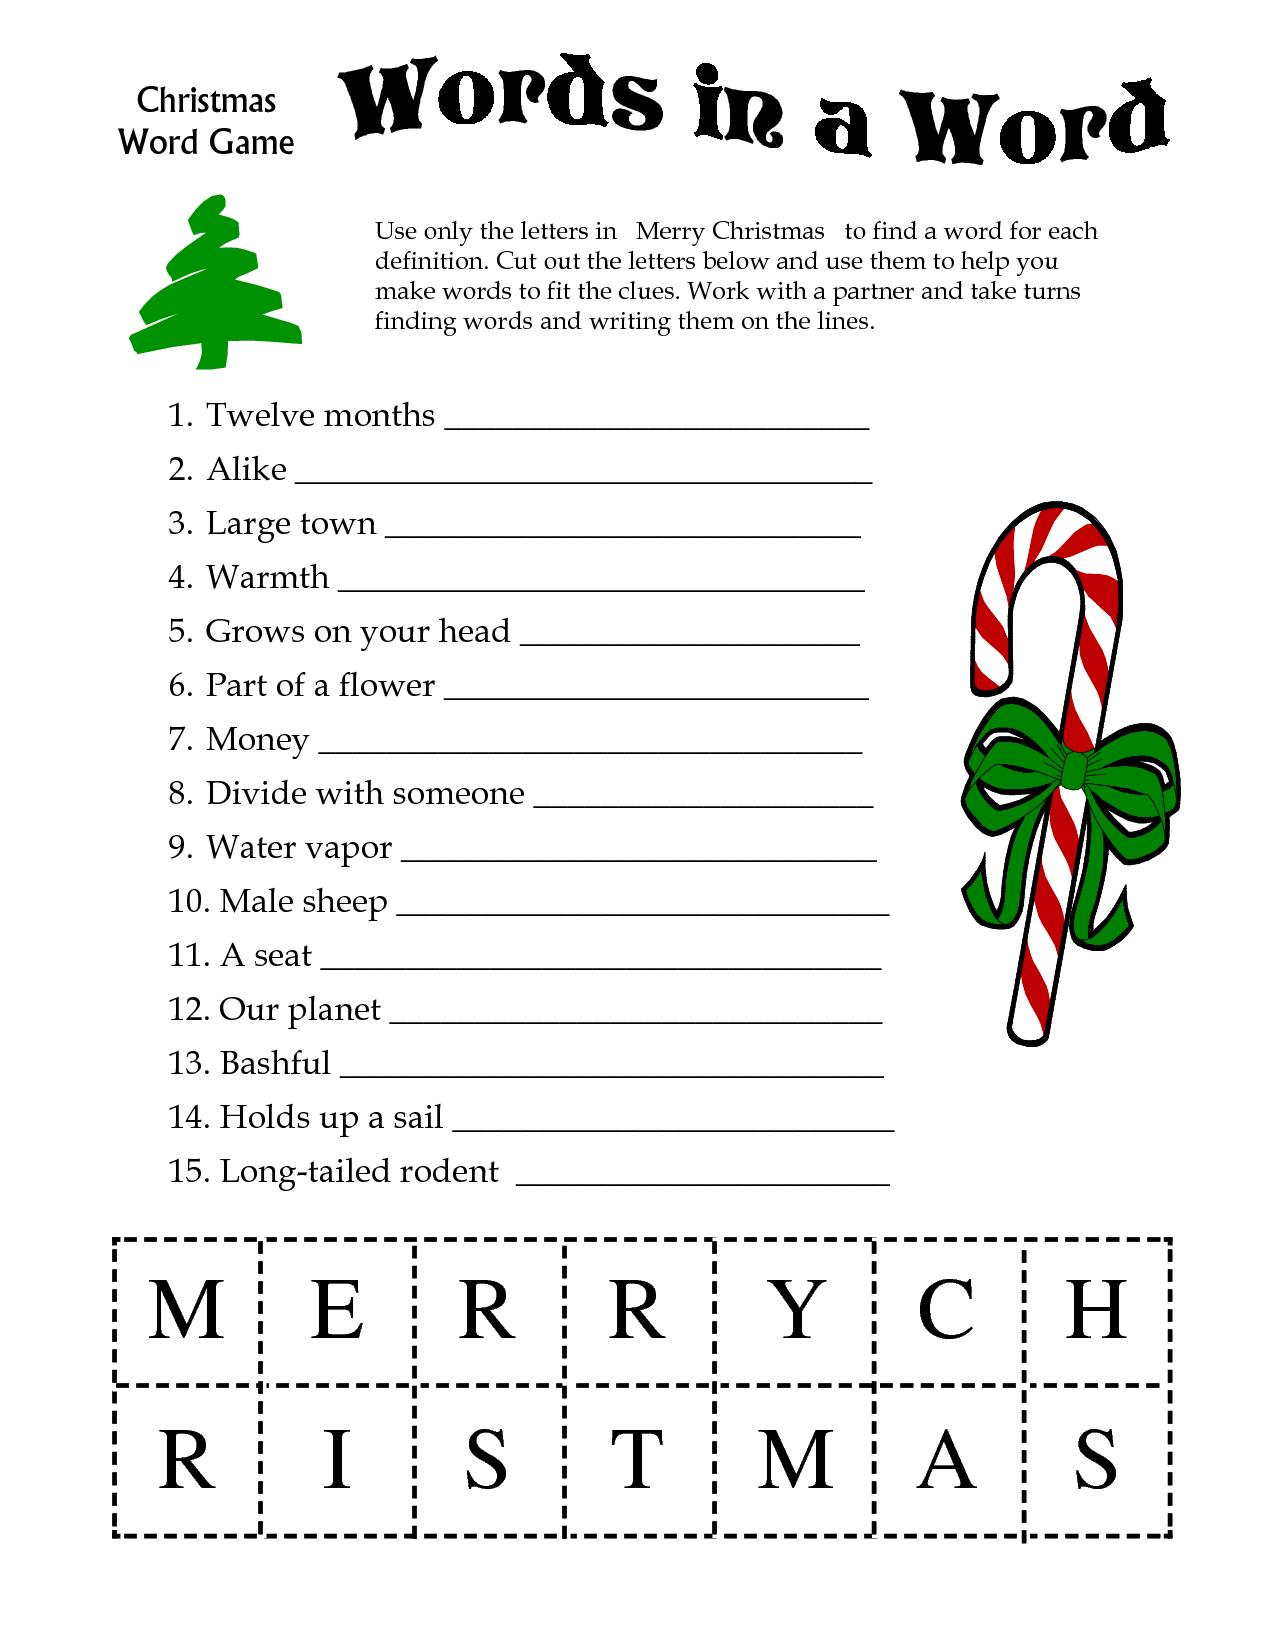 5 Images Of Free Printable Christmas Word Games | Printablee - Free Printable Christmas Games And Puzzles